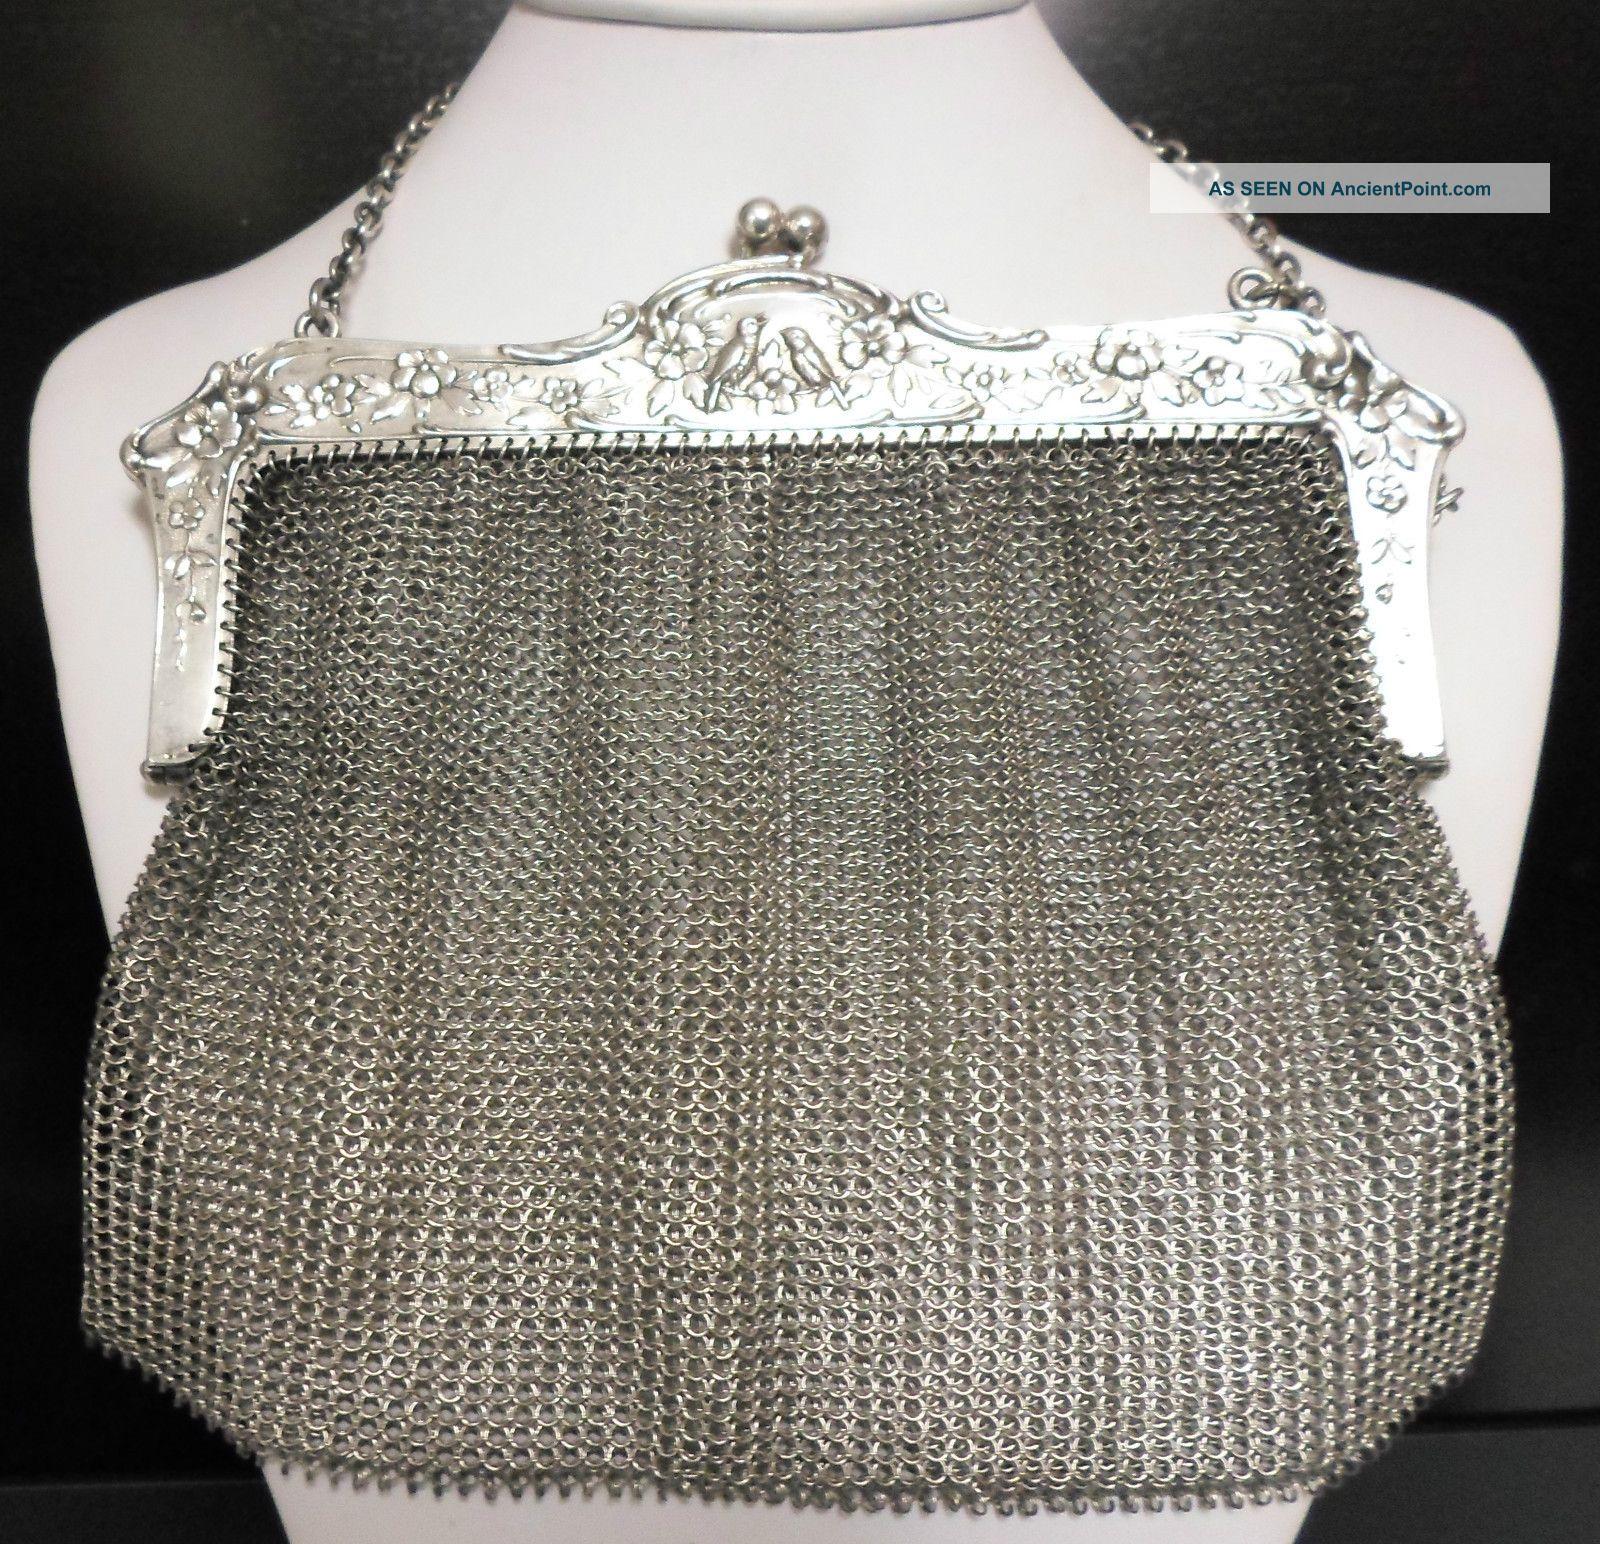 Antique 80% Pure Silver Large Mesh Bird Purse Bag 800 Sterling No Scrap 236gm Silver Alloys (.800-.899) photo